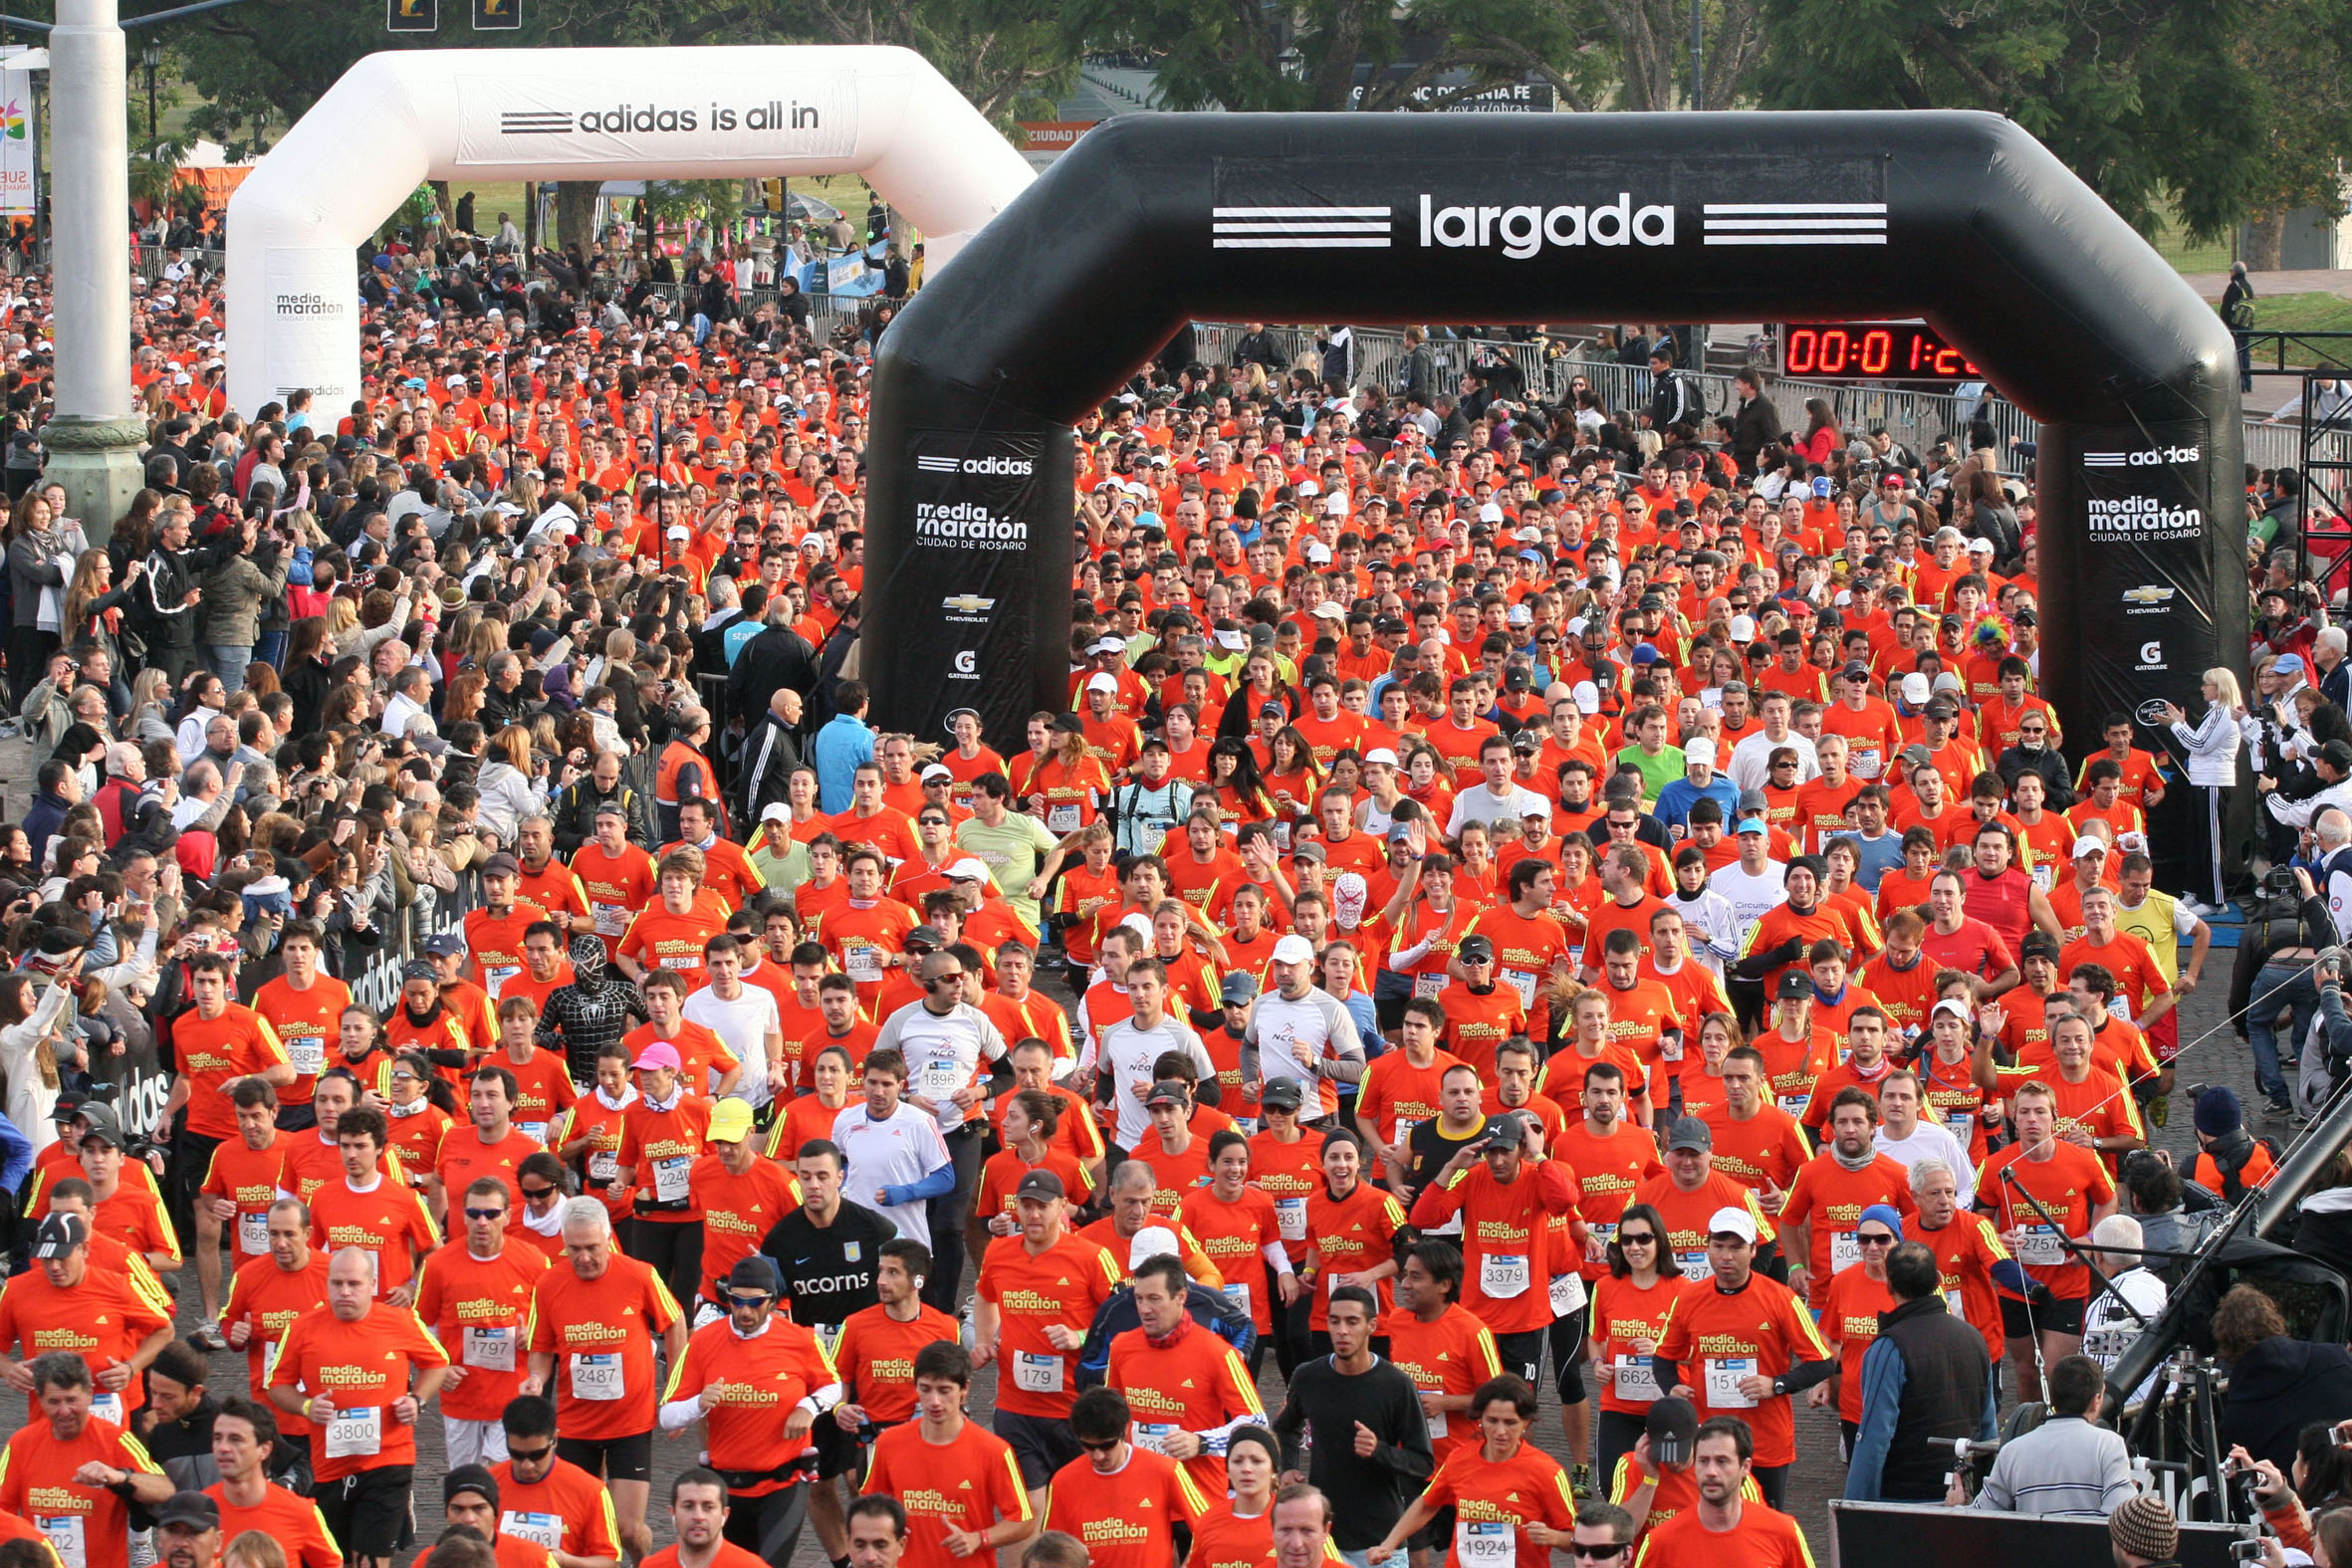 maraton adidas rosario 21k